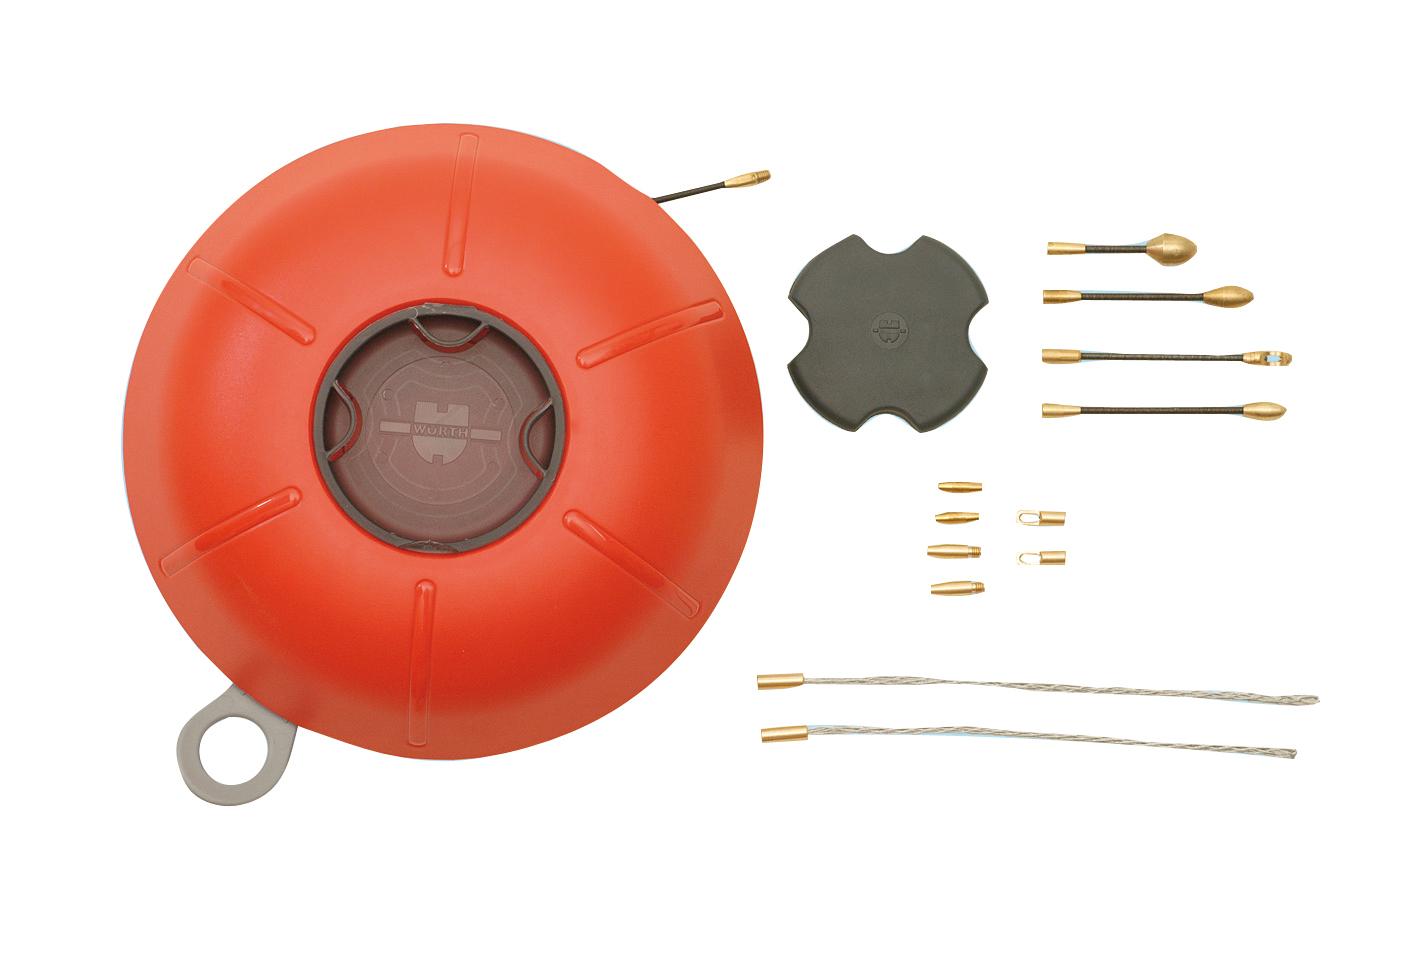 1 Stk Kabeleinzugssystem Glasfaser 30m d=3mm Komplett-Set GI97580119